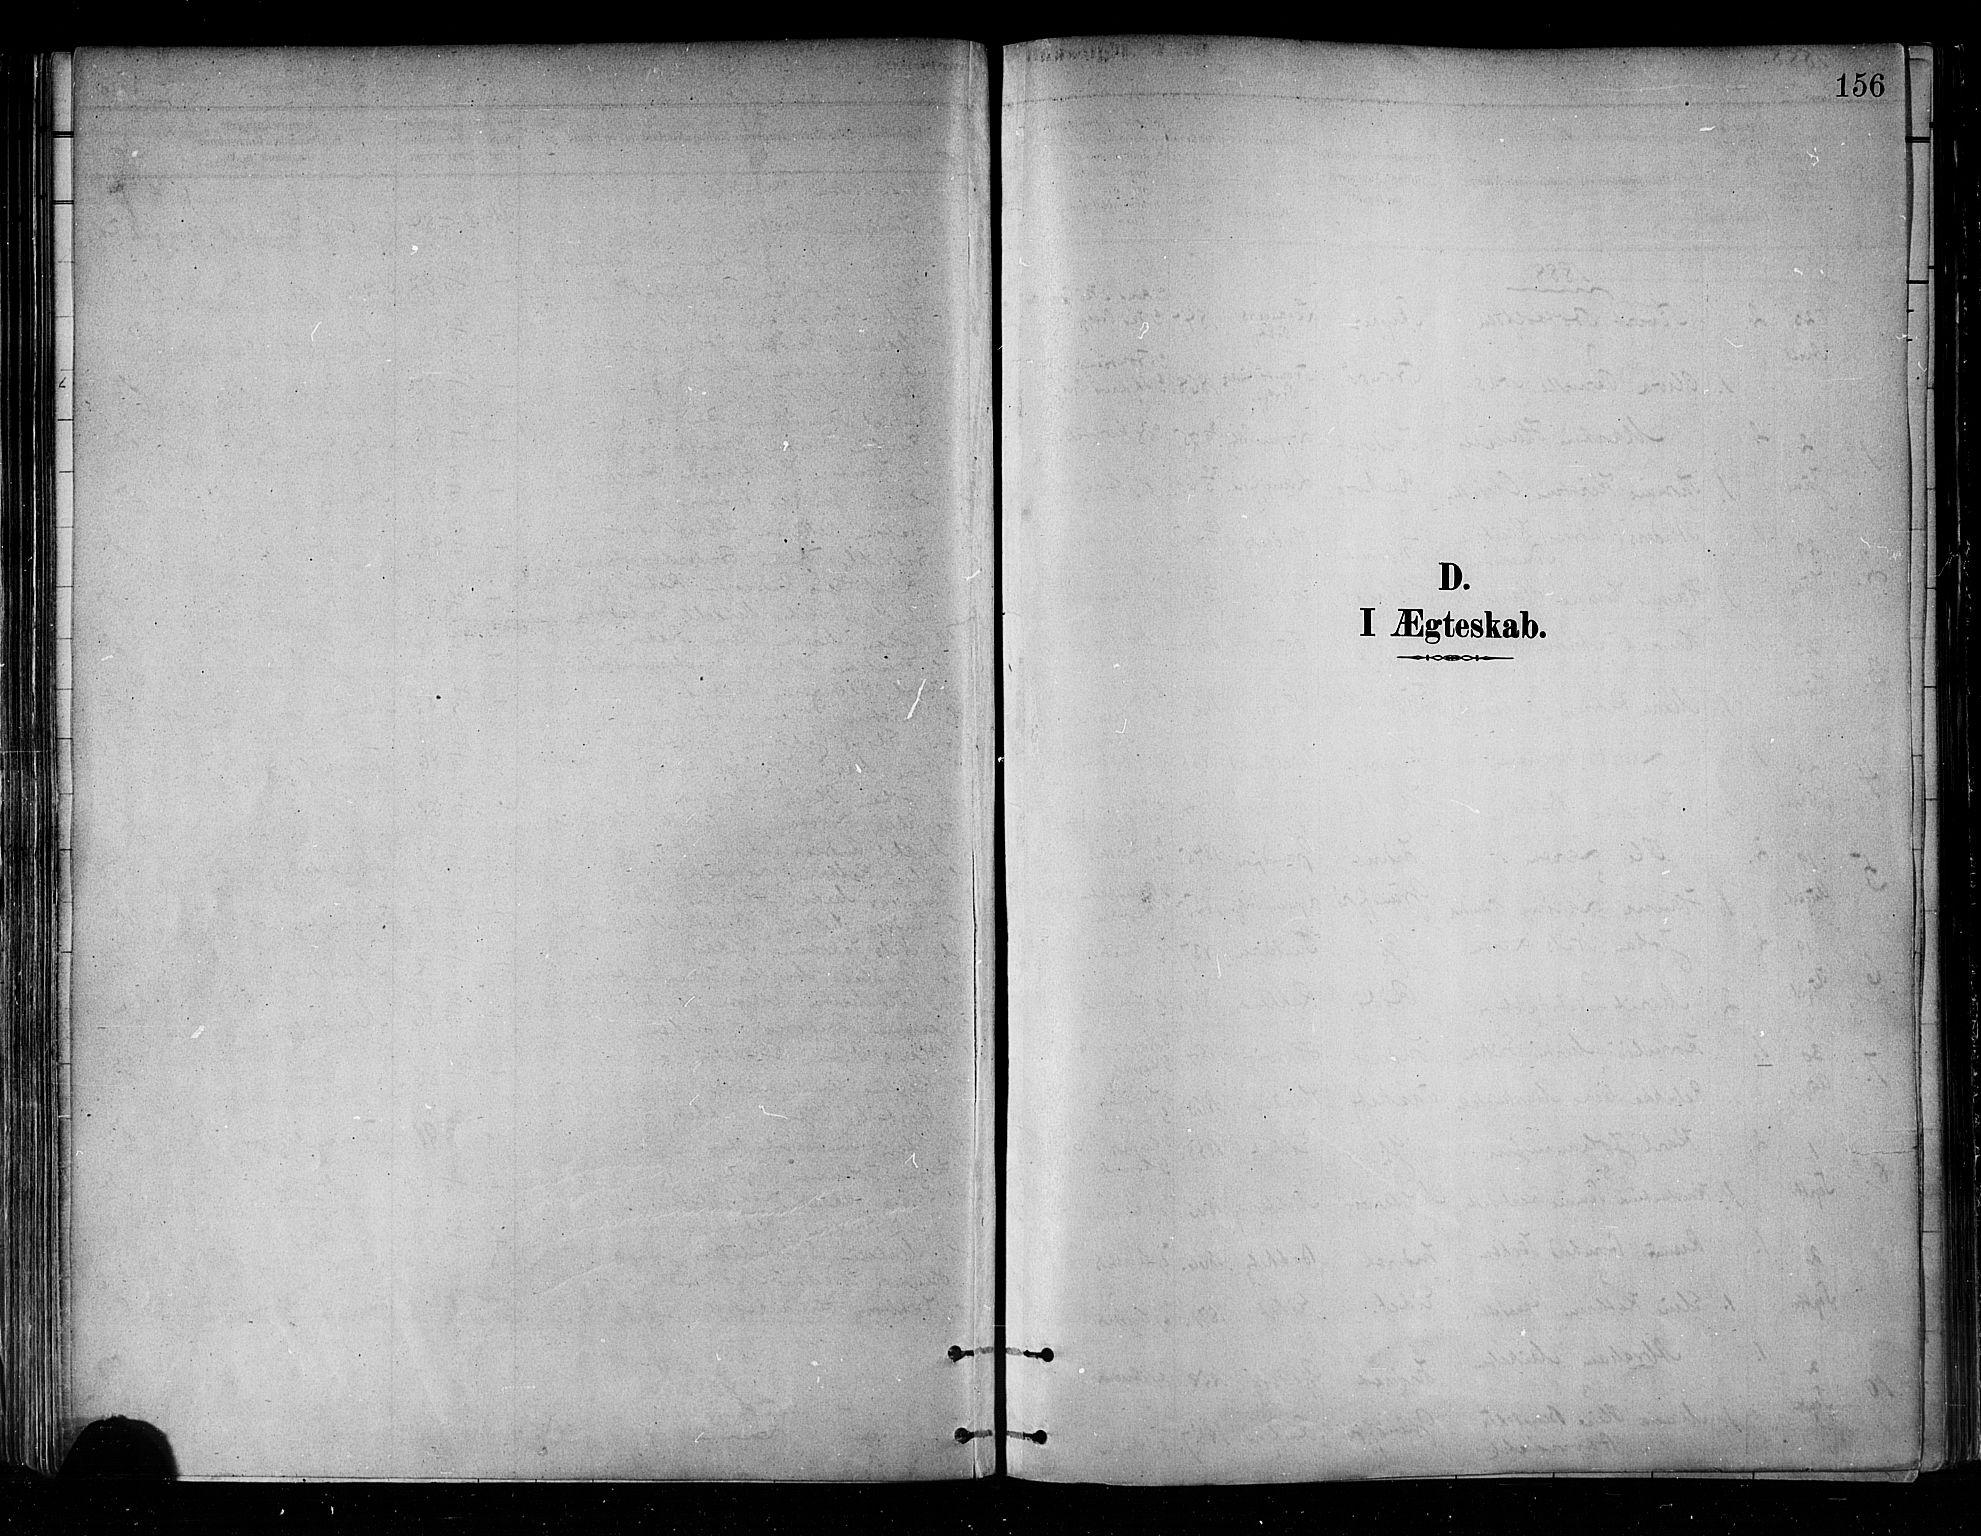 SATØ, Skjervøy sokneprestkontor, H/Ha/Haa/L0010kirke: Ministerialbok nr. 10, 1887-1898, s. 156